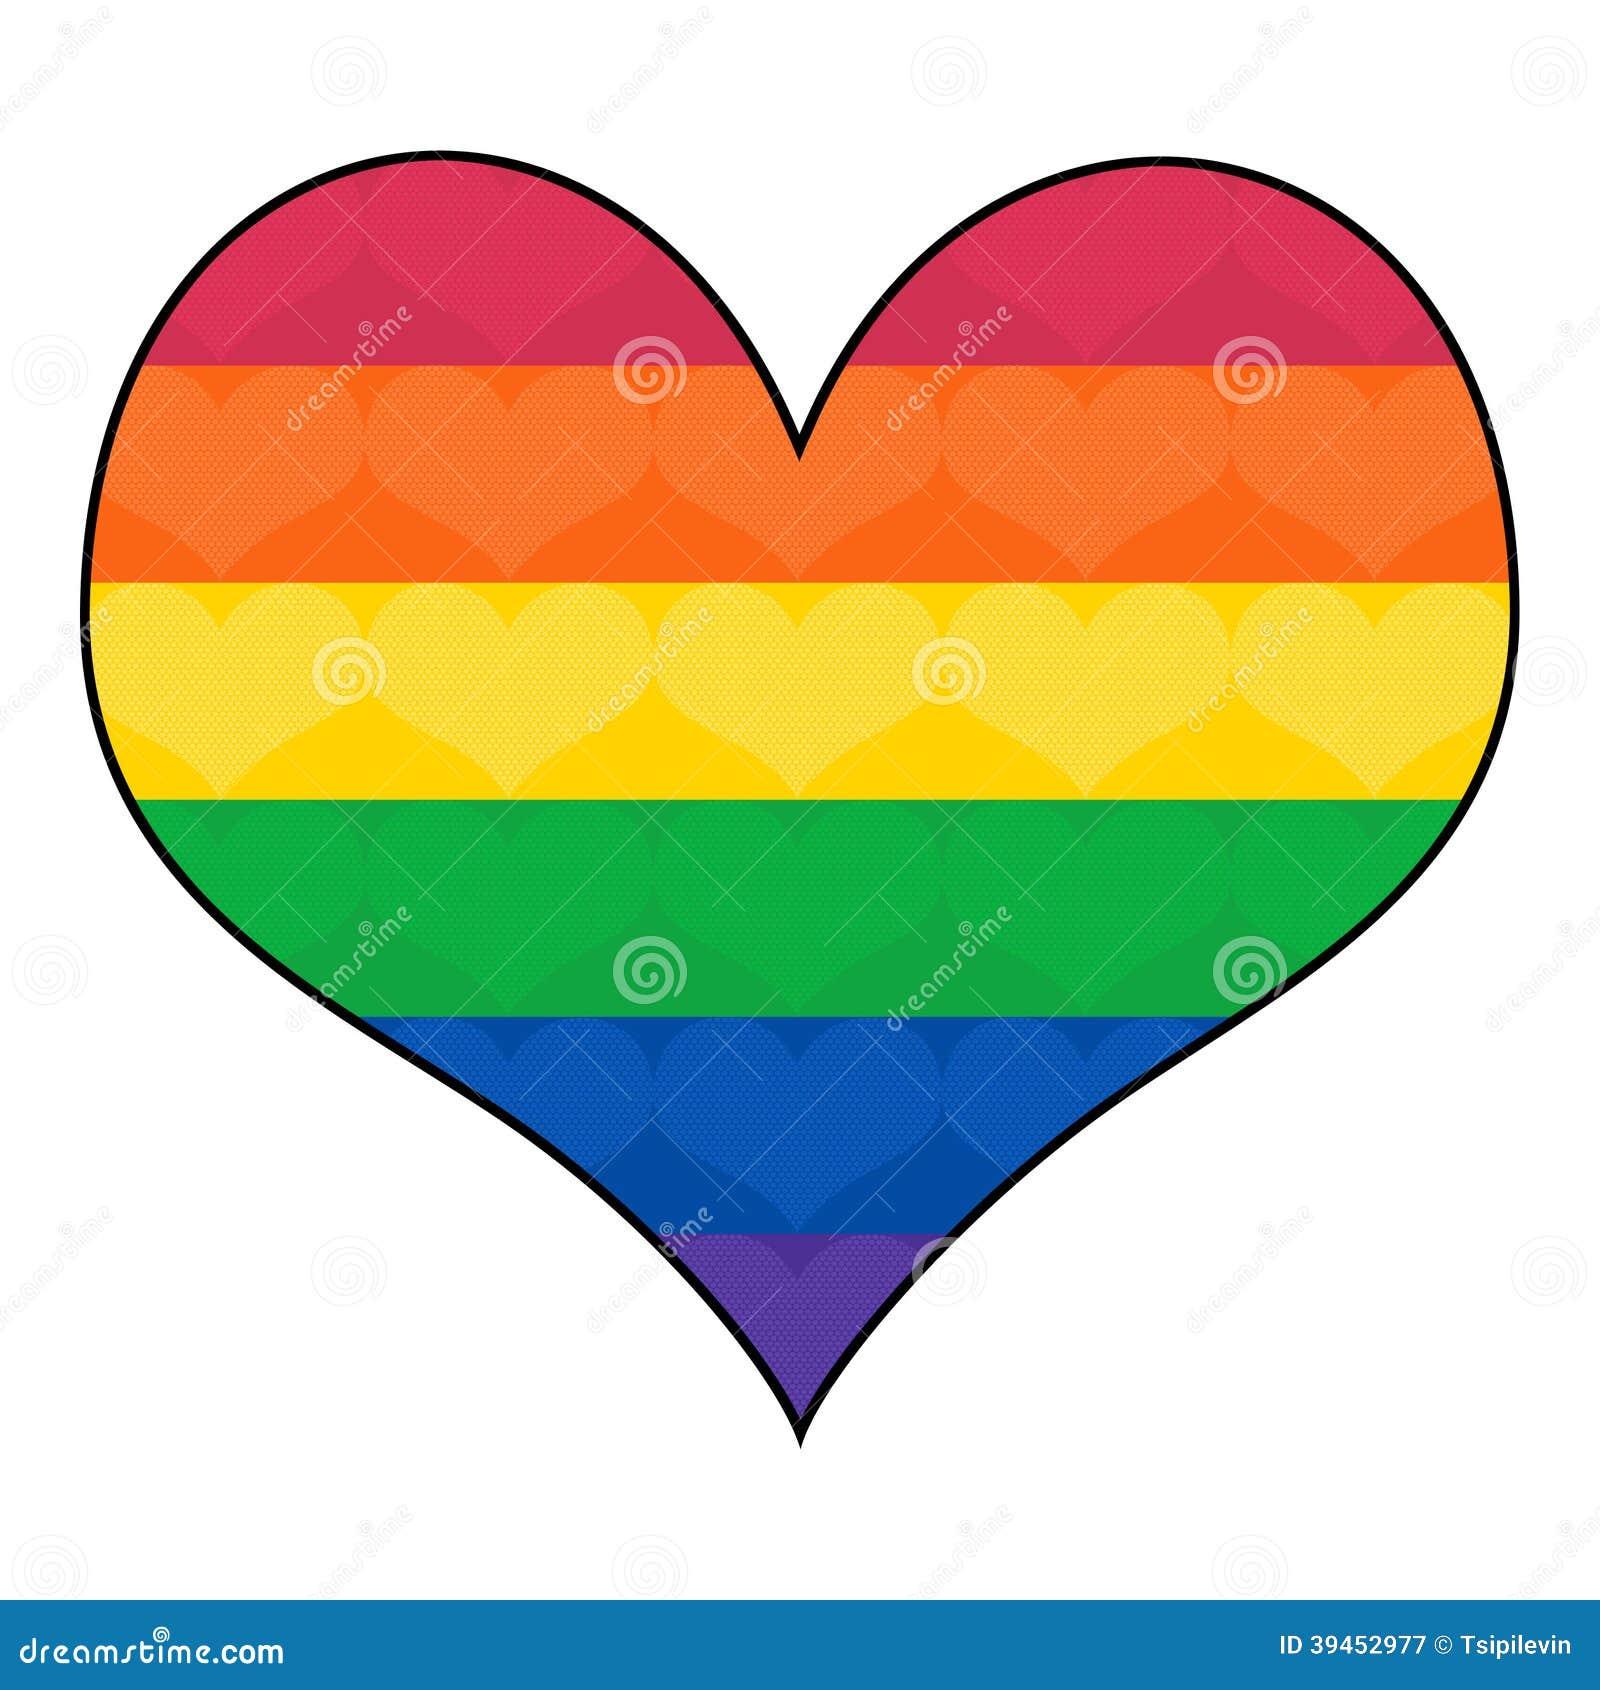 from Hugh colors gay rainbow